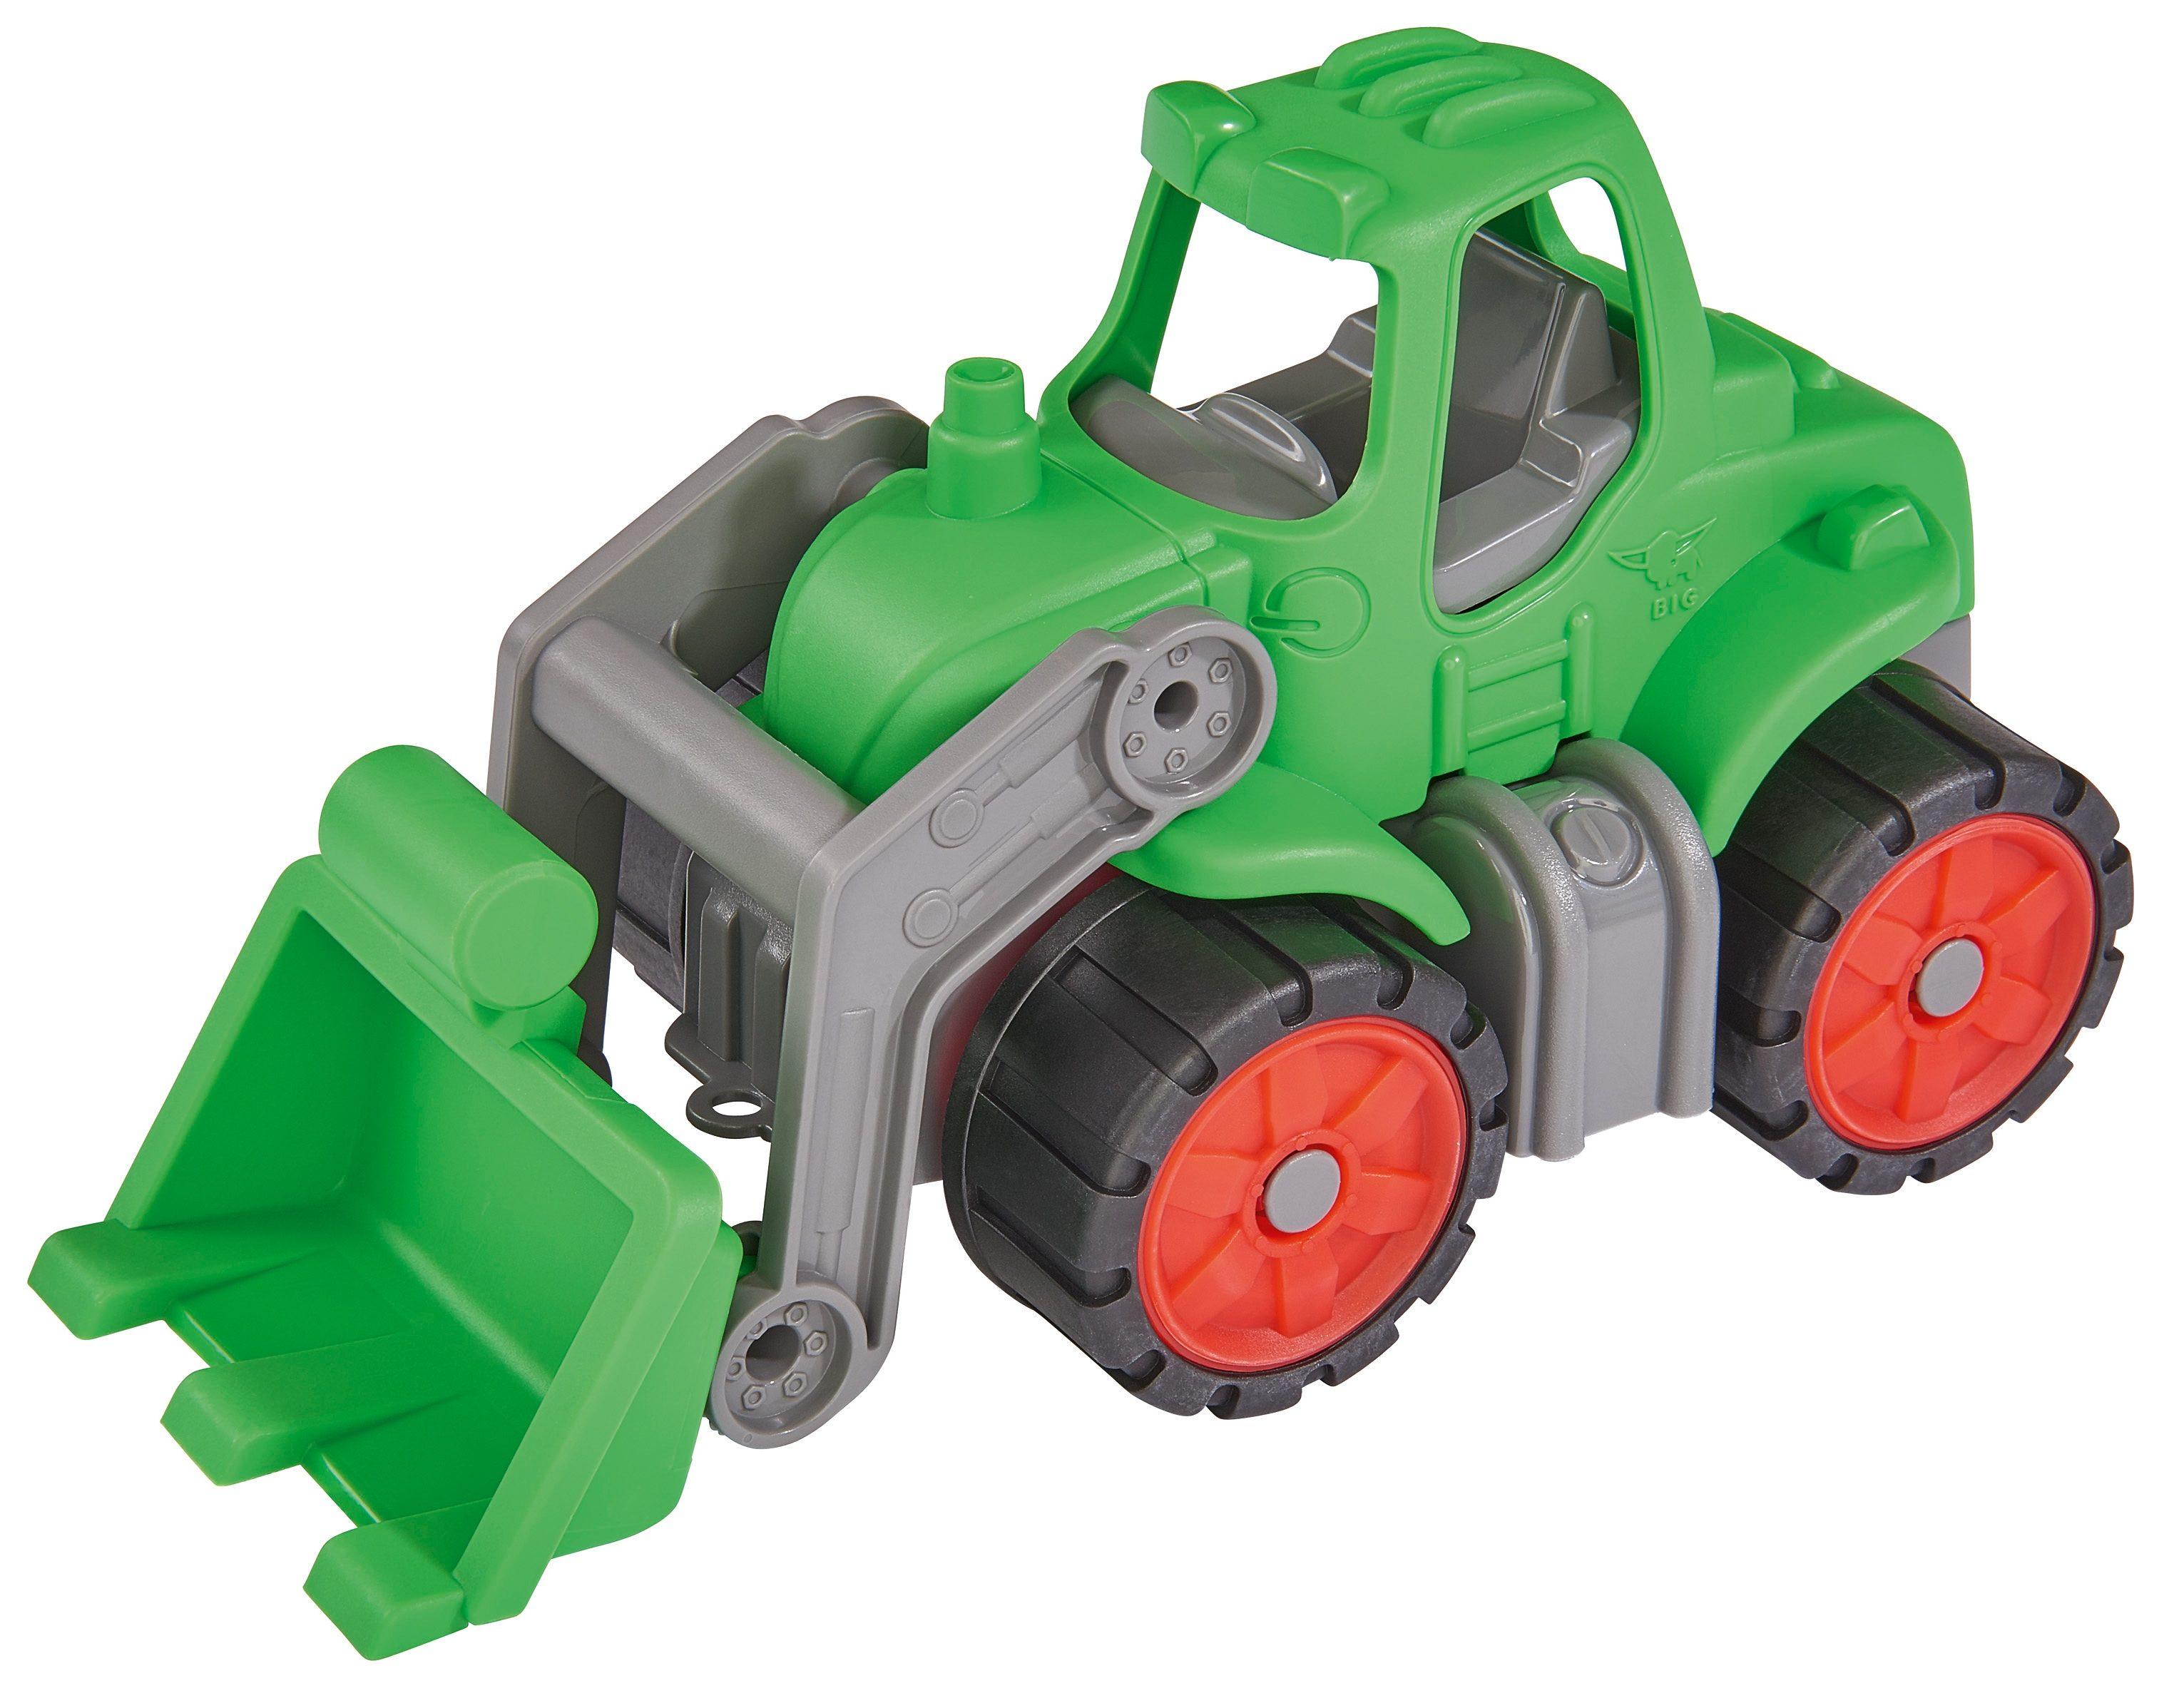 BIG Spielfahrzeug mit großer Schaufel, »BIG Power Worker Mini Traktor grün«